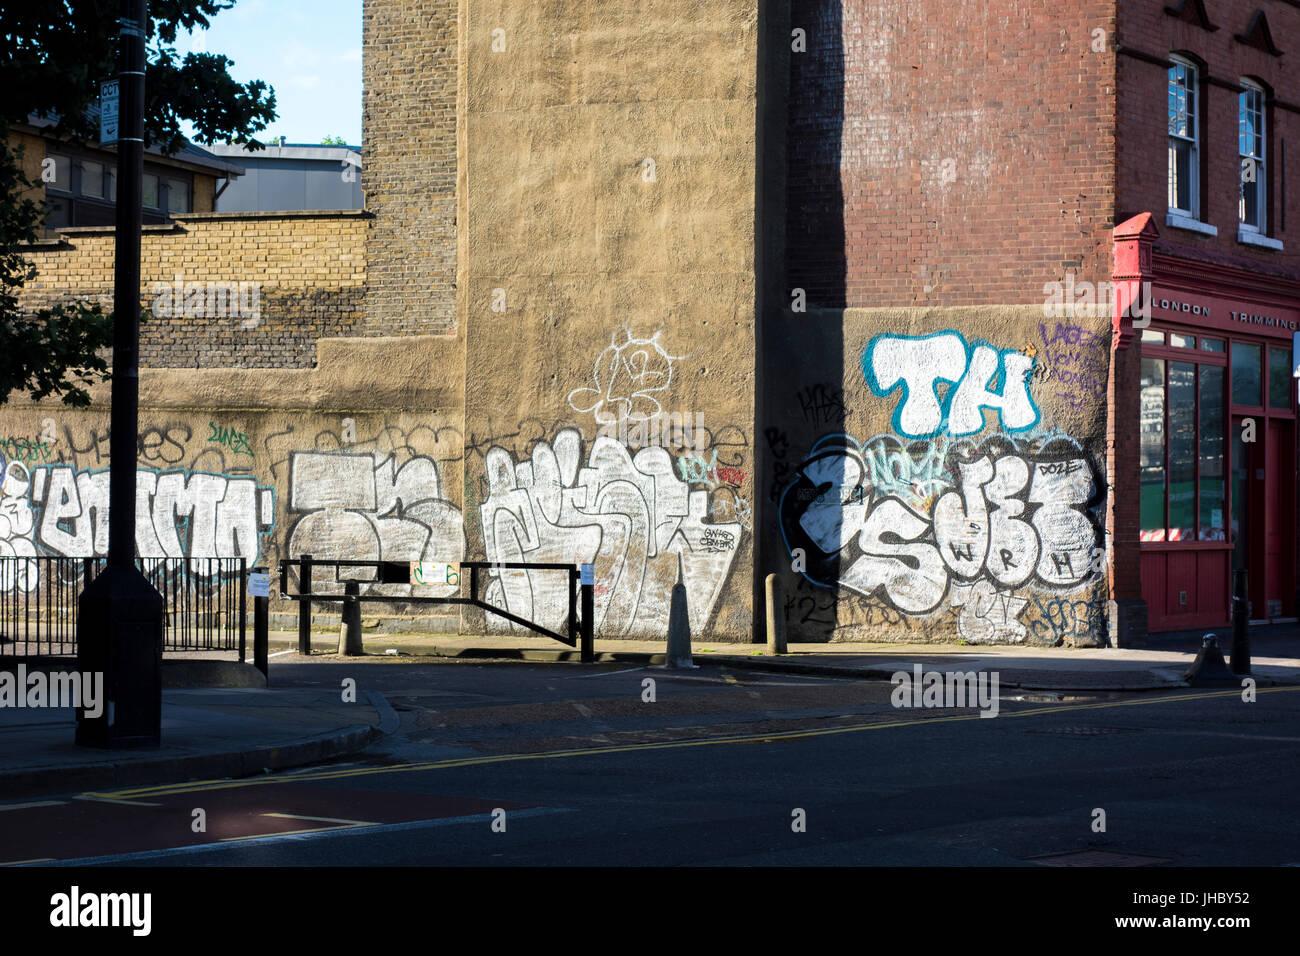 Graffiti wall cambridge - Graffiti On The Side Of A Building Cambridge Heath Road Bethnal Green Tower Hamlets East London Uk